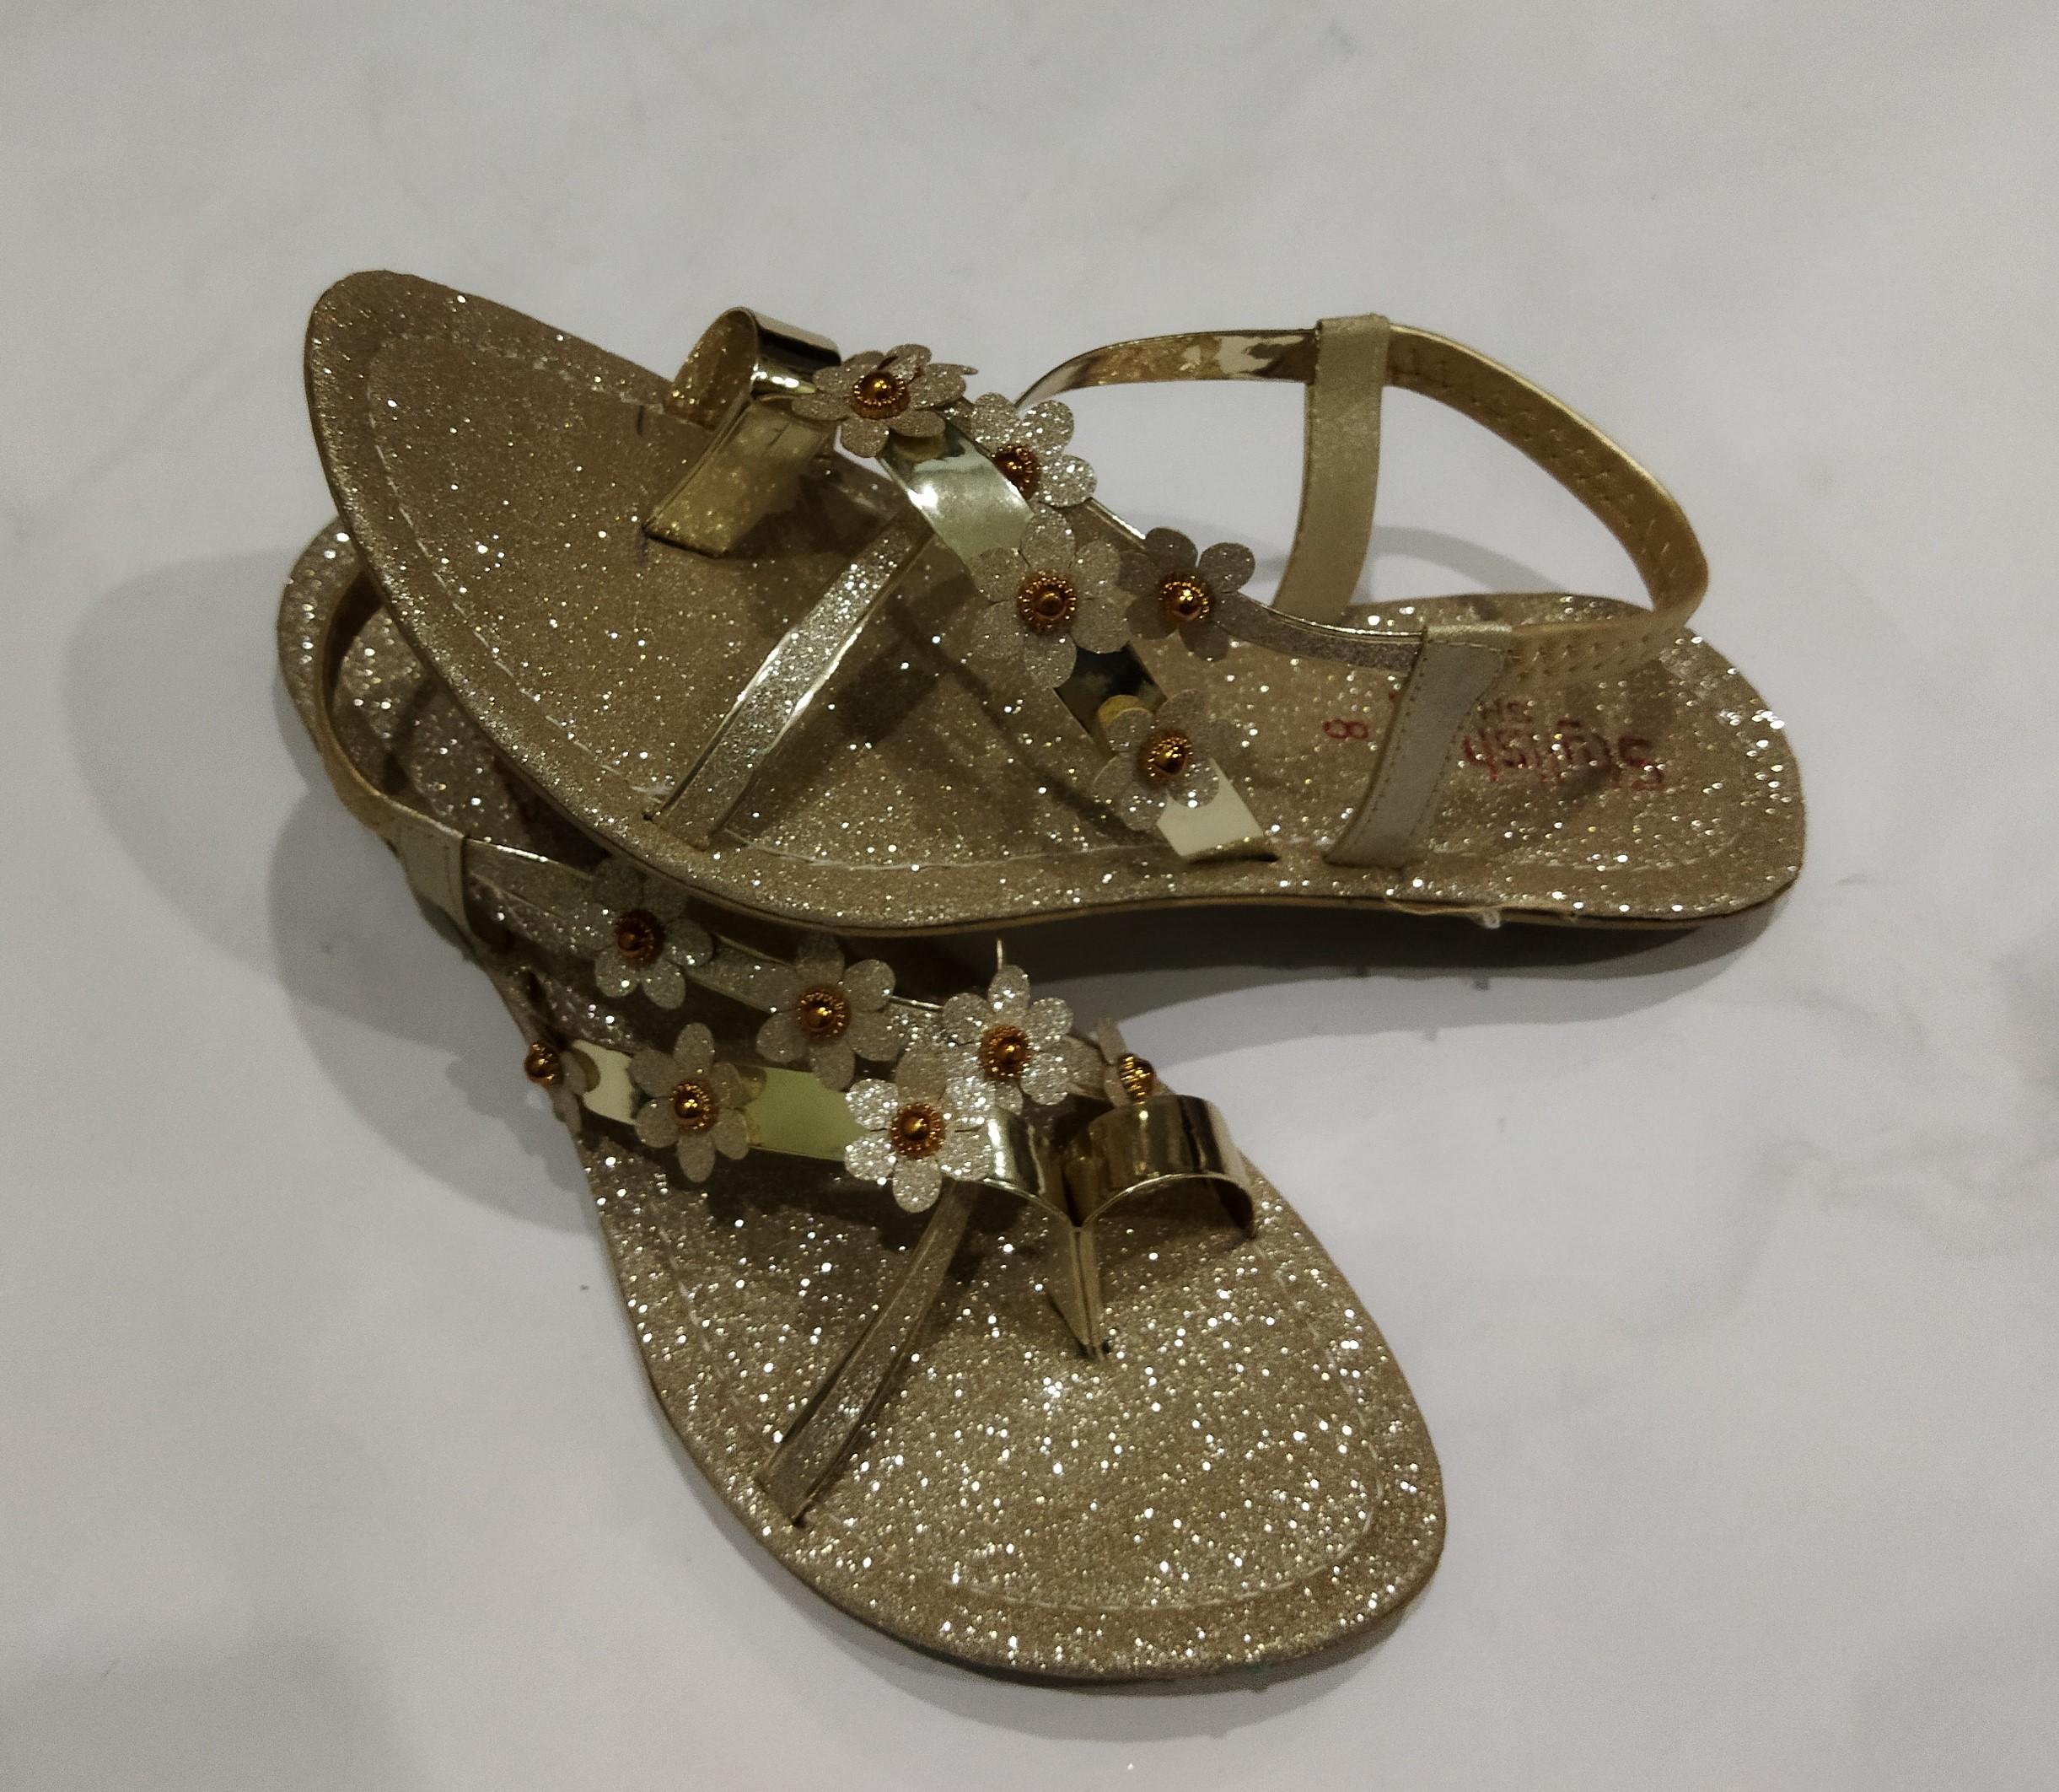 Sandals for grils or women bg18